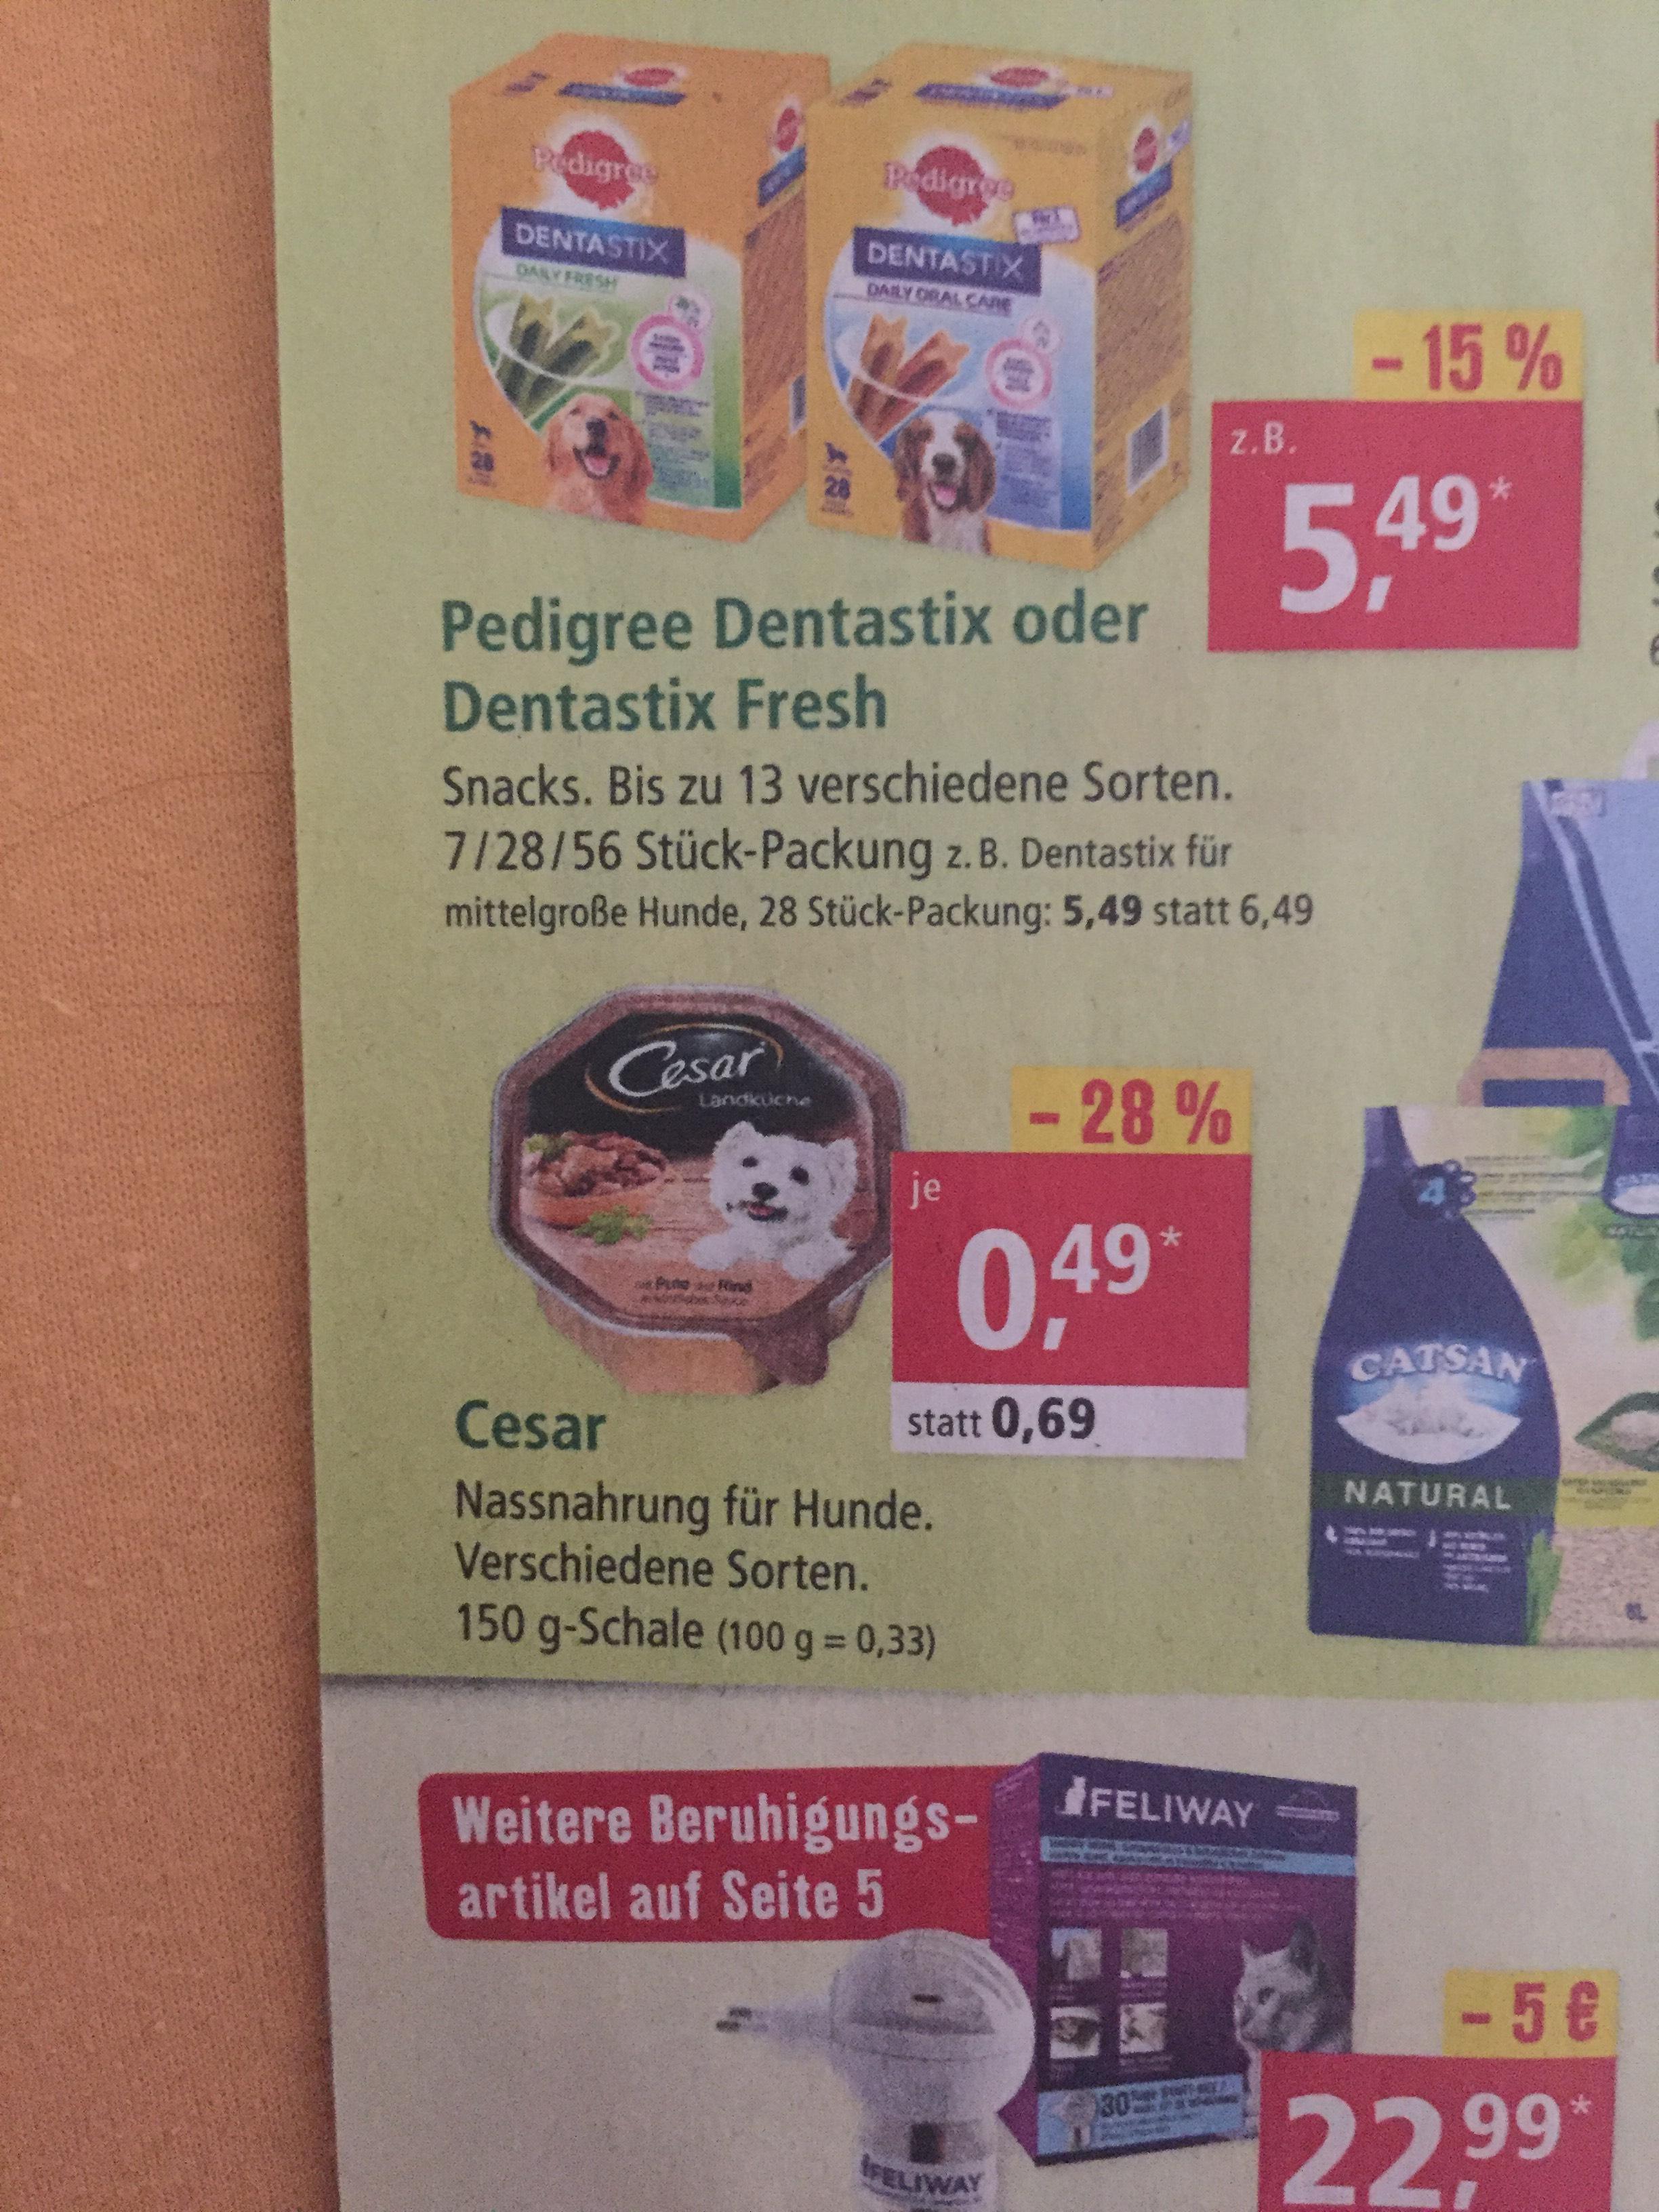 ~Fressnapf/Müller~ Cesar Hundefutter und Marktguru gibt 0,25€ Cashback